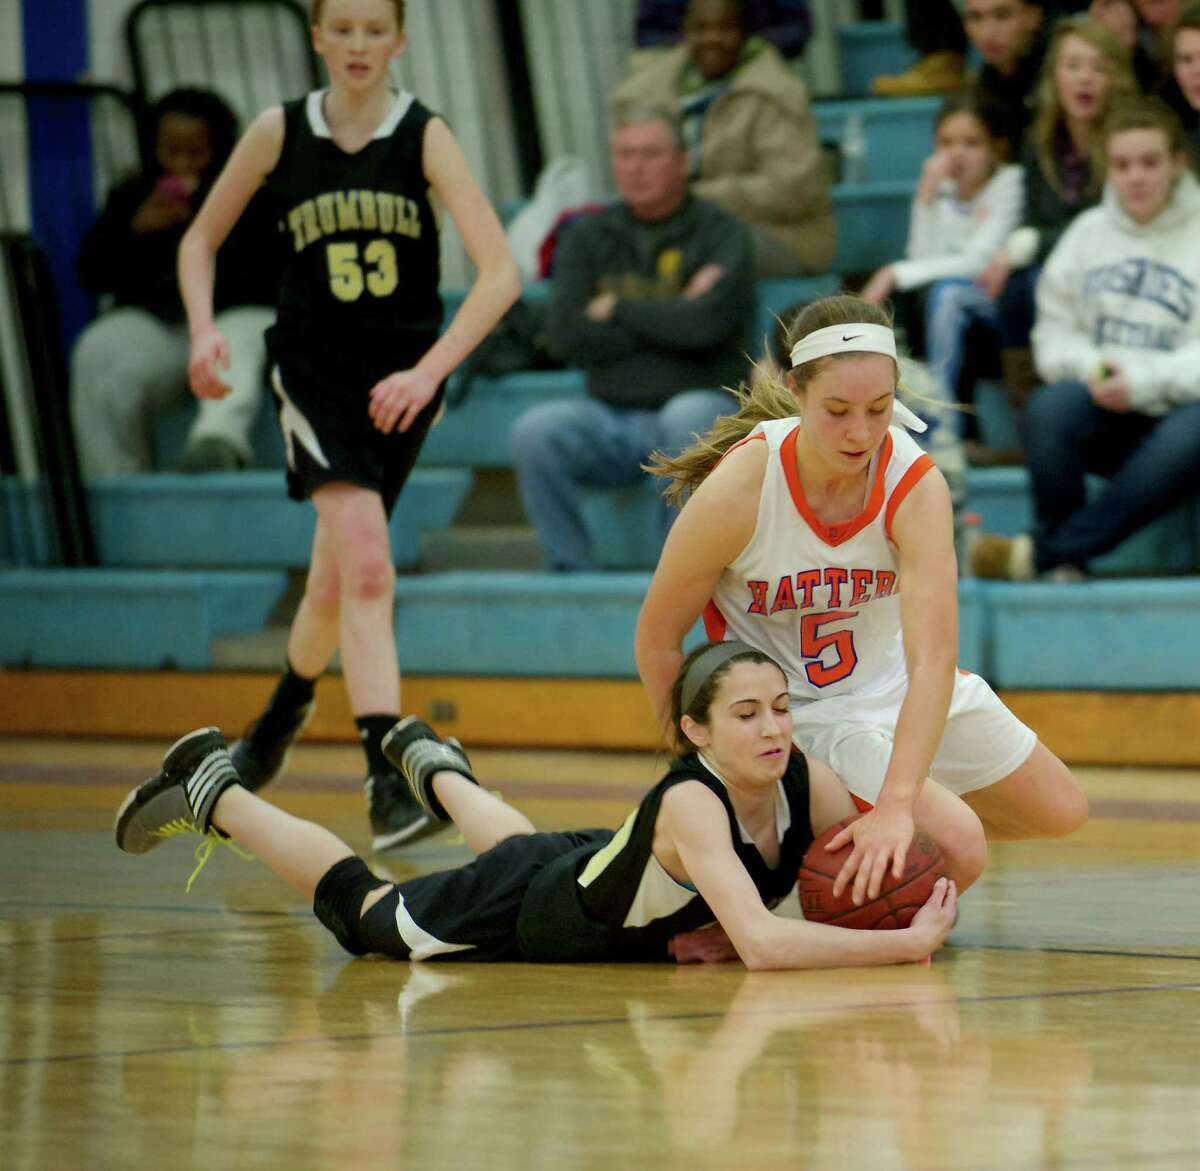 Trumbull's Victoria Ray (30) and Danbury's Rachel Gartner (5) fight for the ball during the Trumbull vs. Danbury girls FCIAC basketball game, at Danbury High School in Danbury, Conn, on Tuesday, January 7, 2014.